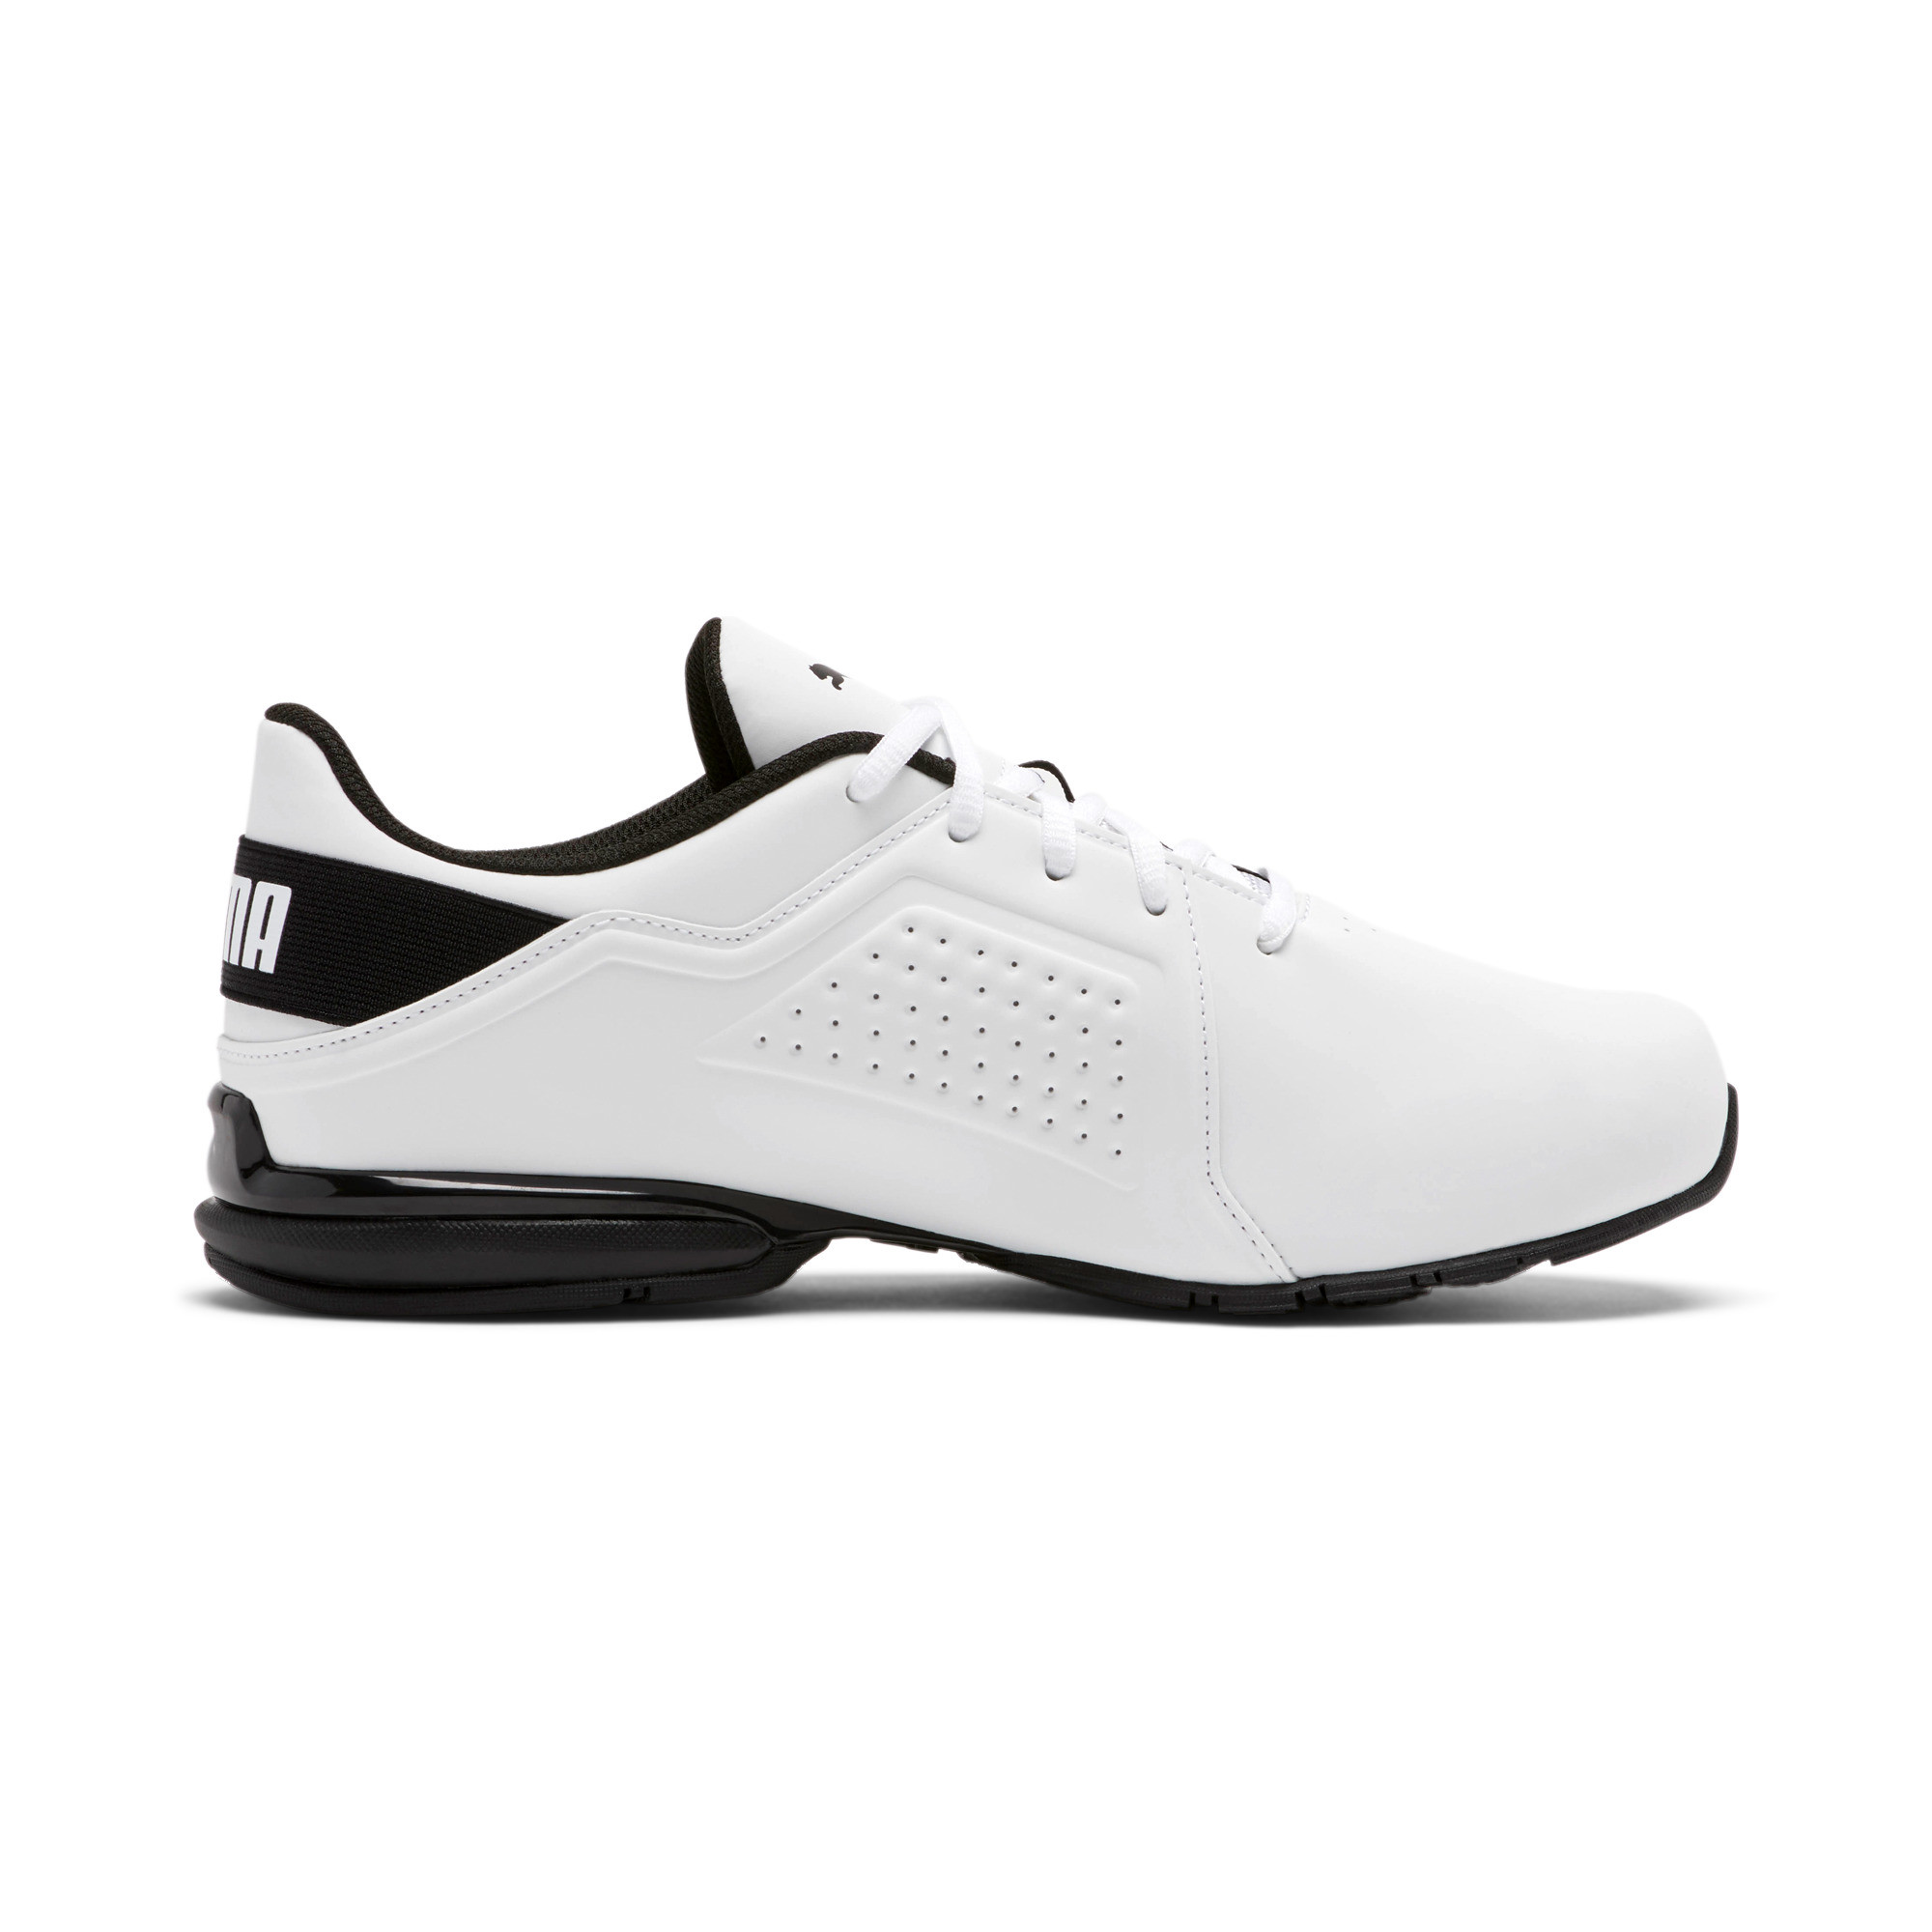 PUMA-Men-039-s-Viz-Runner-Wide-Shoes thumbnail 6